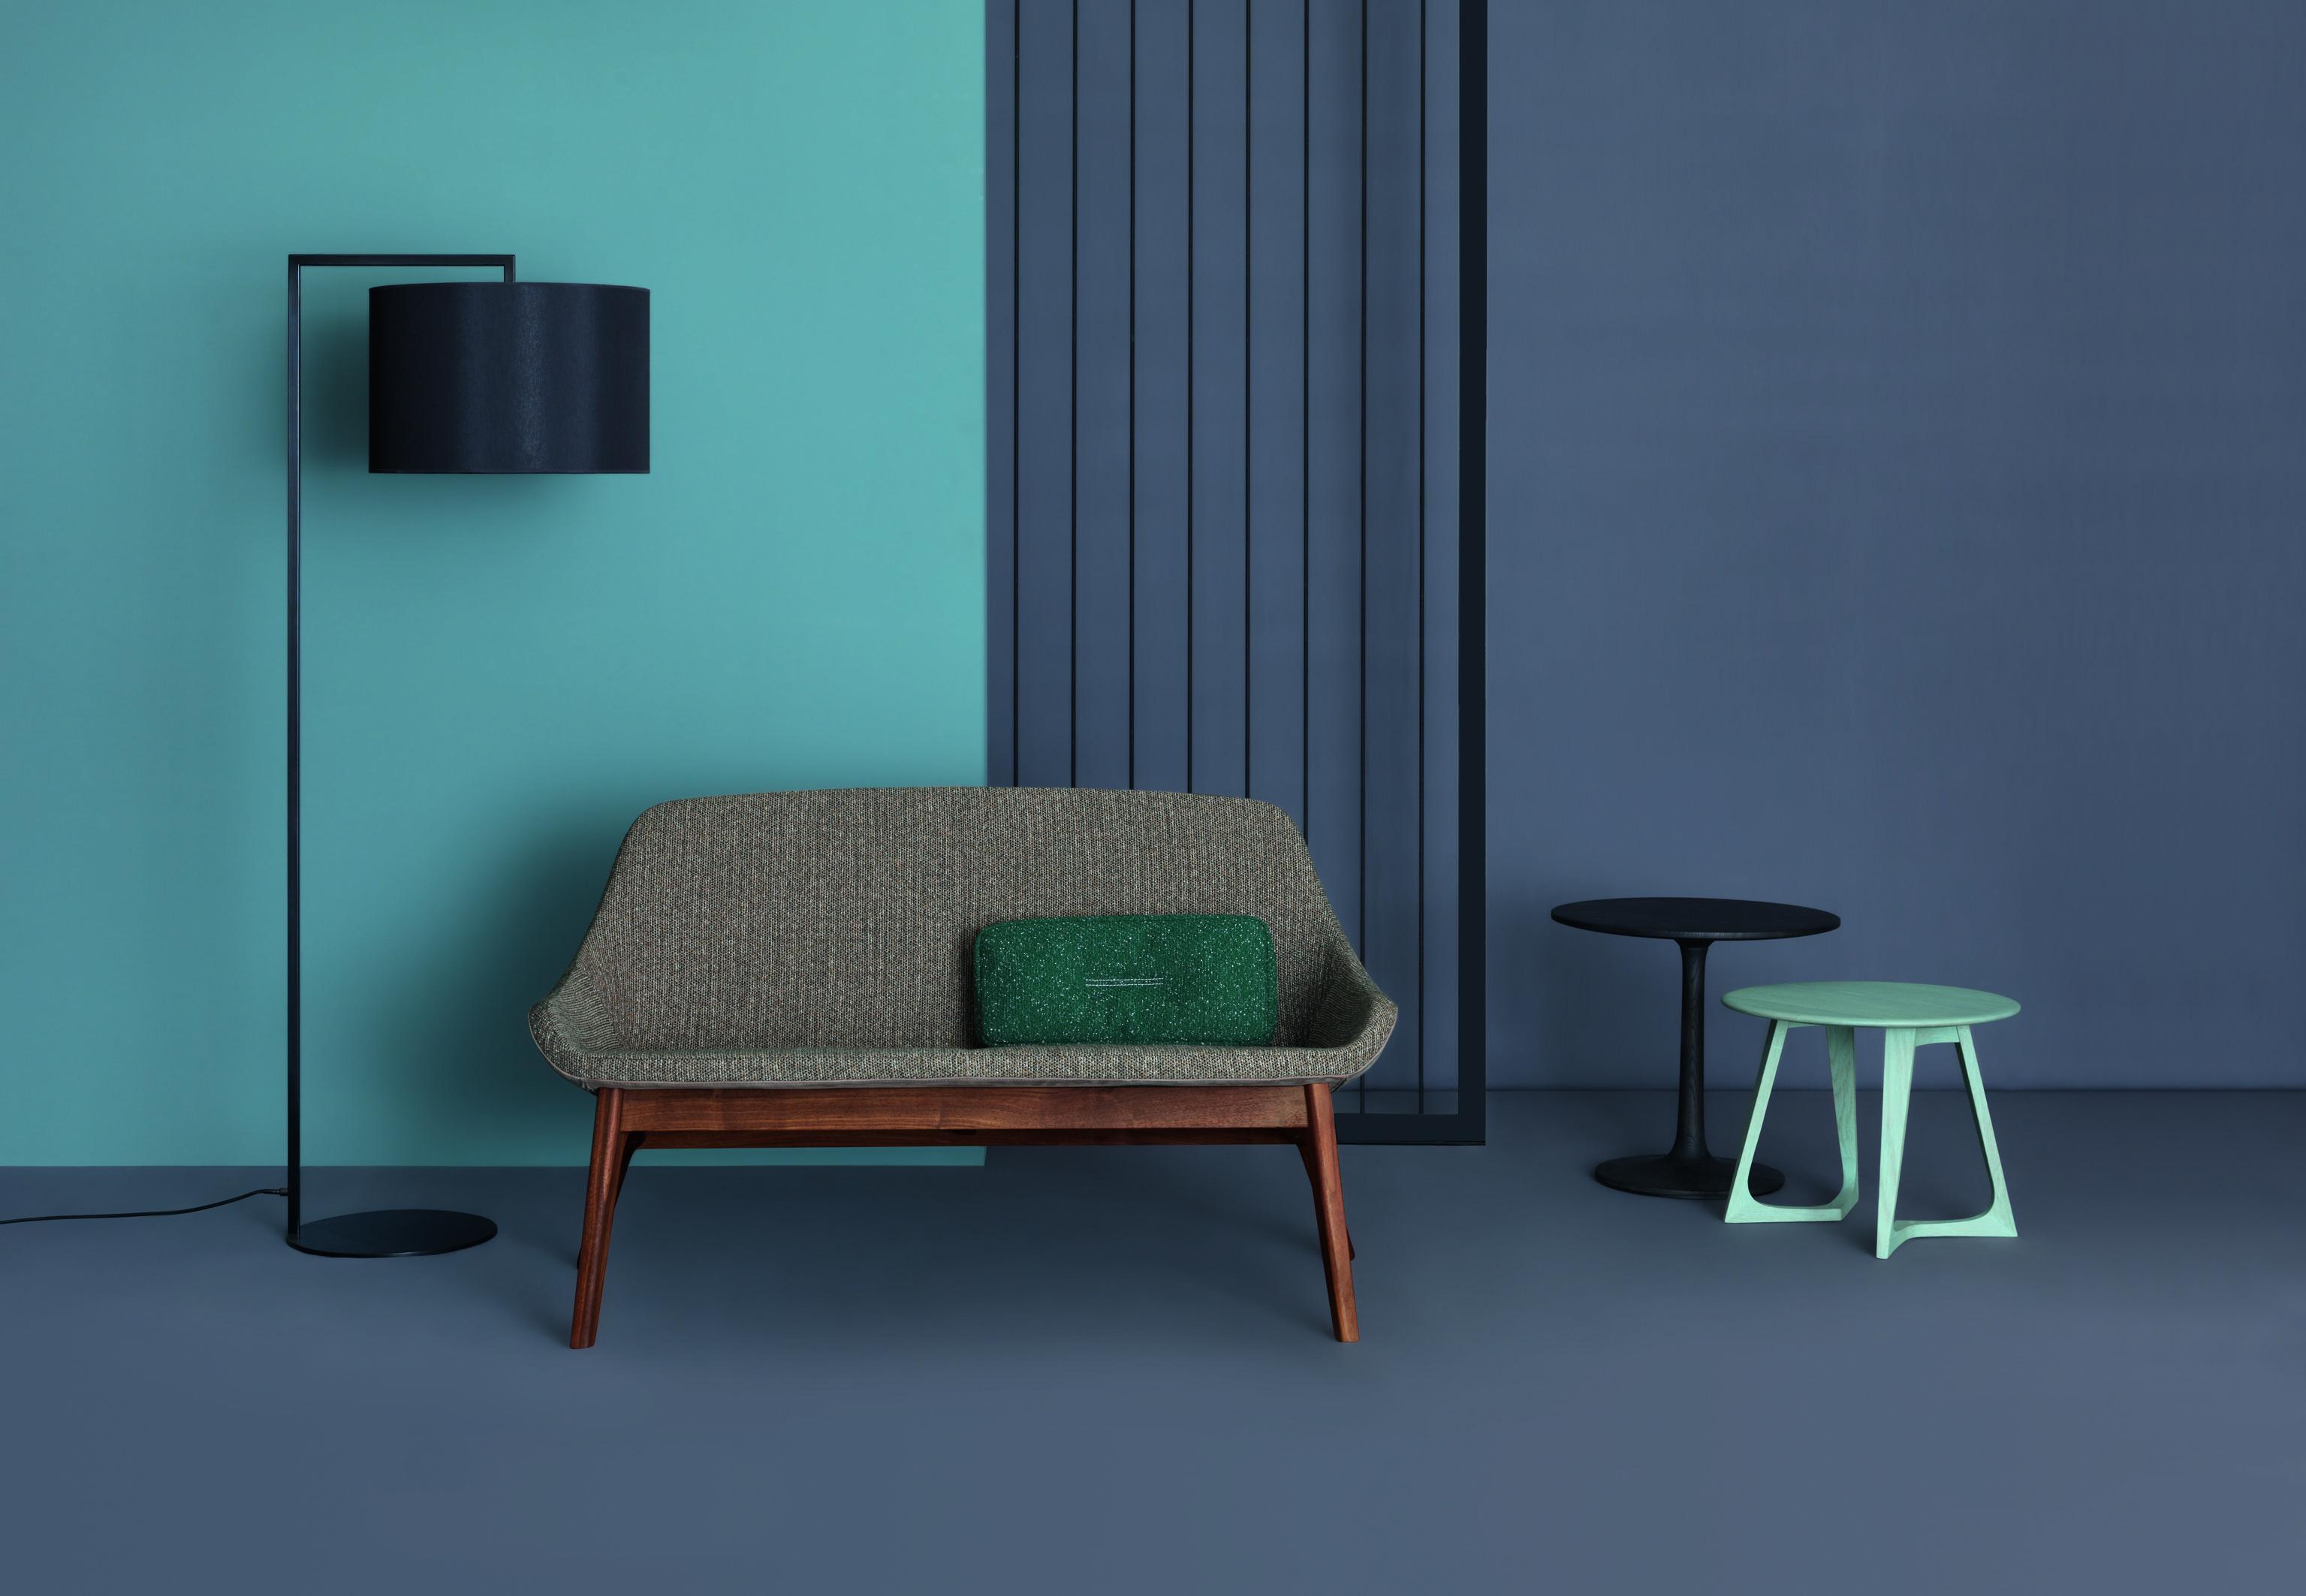 Morph Duo Lounge Seat by Zeitraum | Clerkenwell Design Week 2015 ...